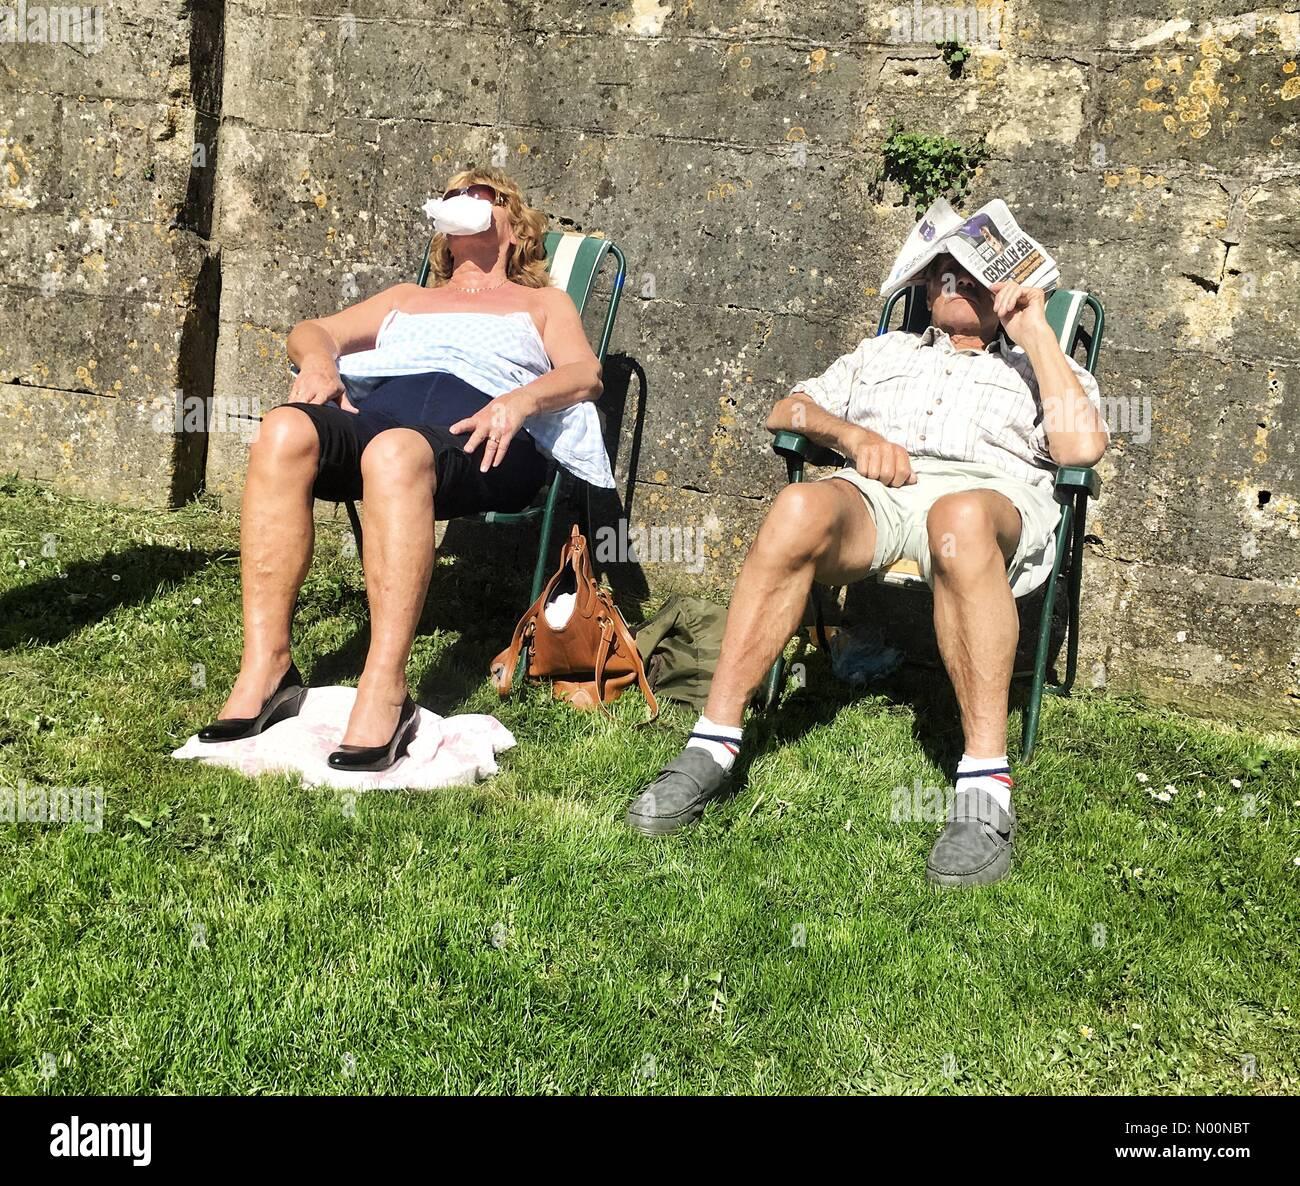 Bathampton, UK. 18th April 2018.  UK Weather: sunbathing in Bathampton Credit: nidpor / StockimoNews/Alamy Live News - Stock Image